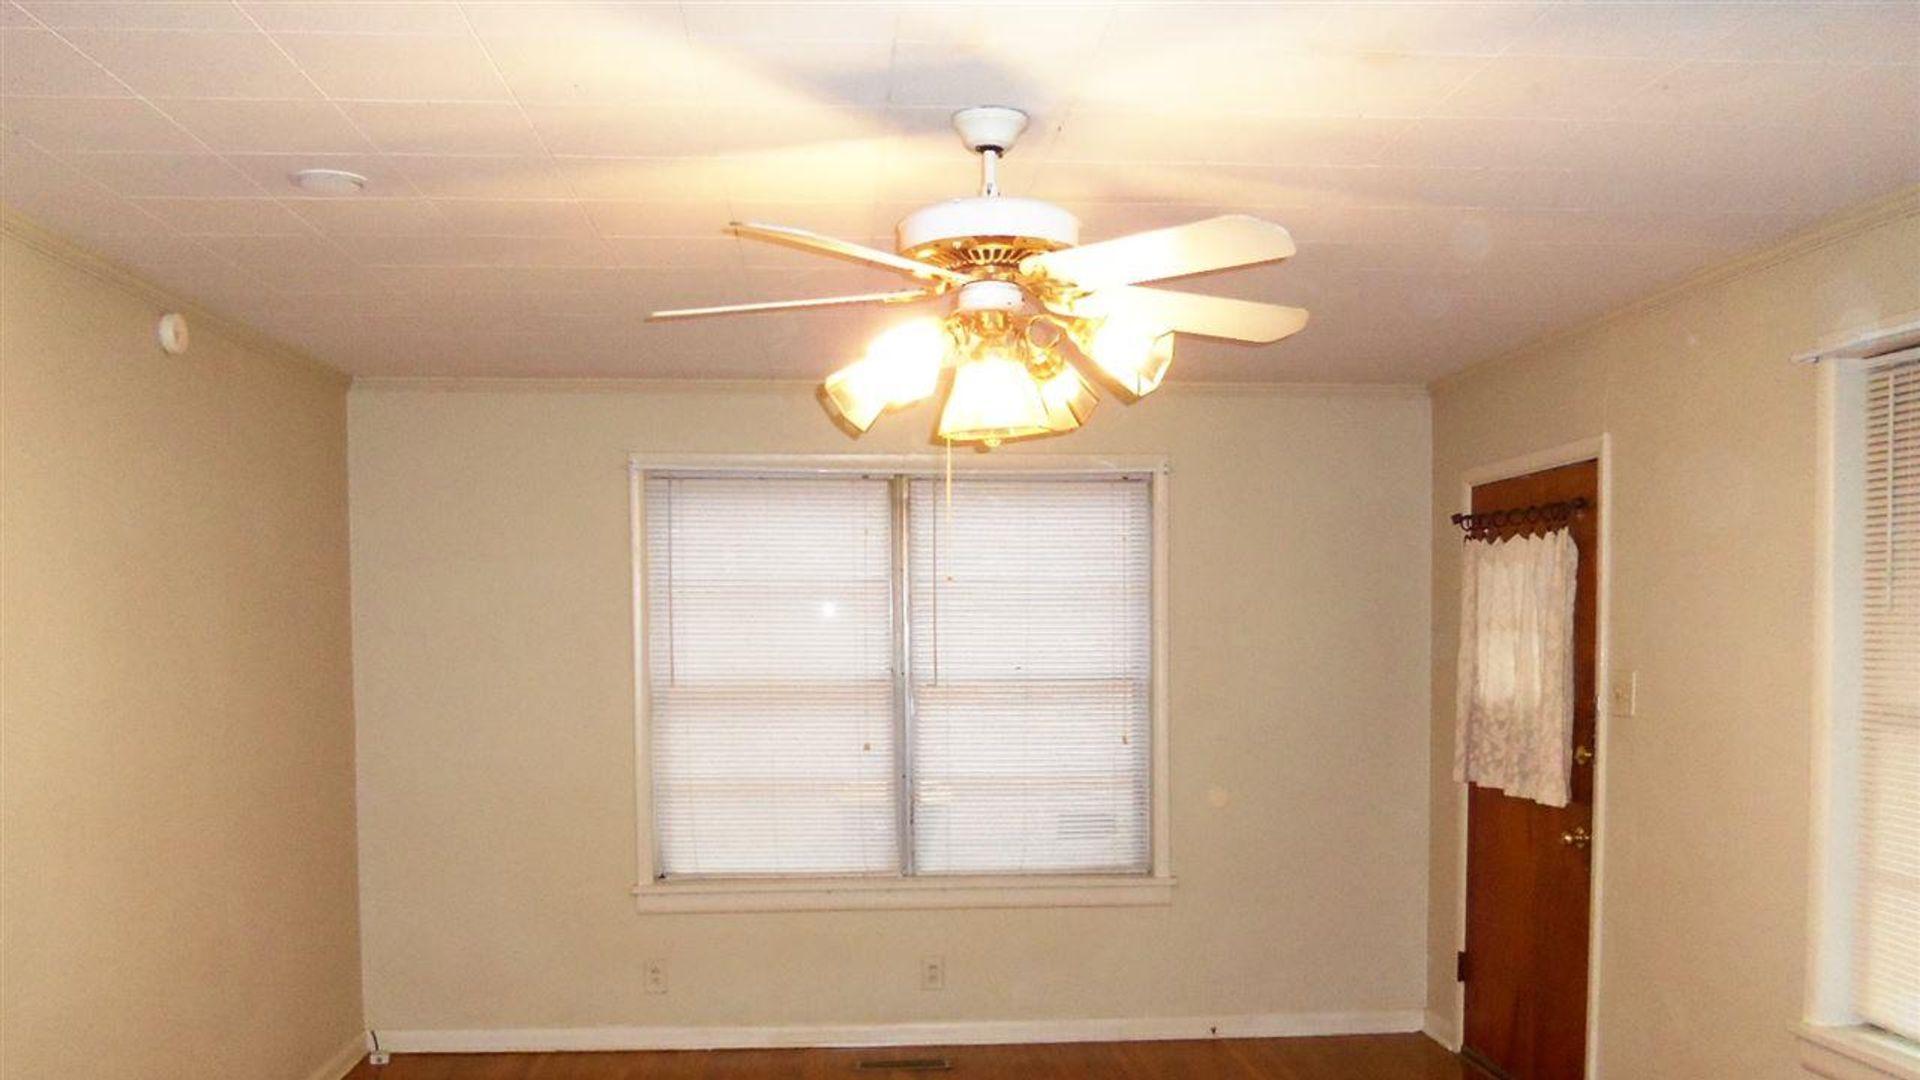 2 bedroom duplex at N Cypress St, North Little Rock, AR ...